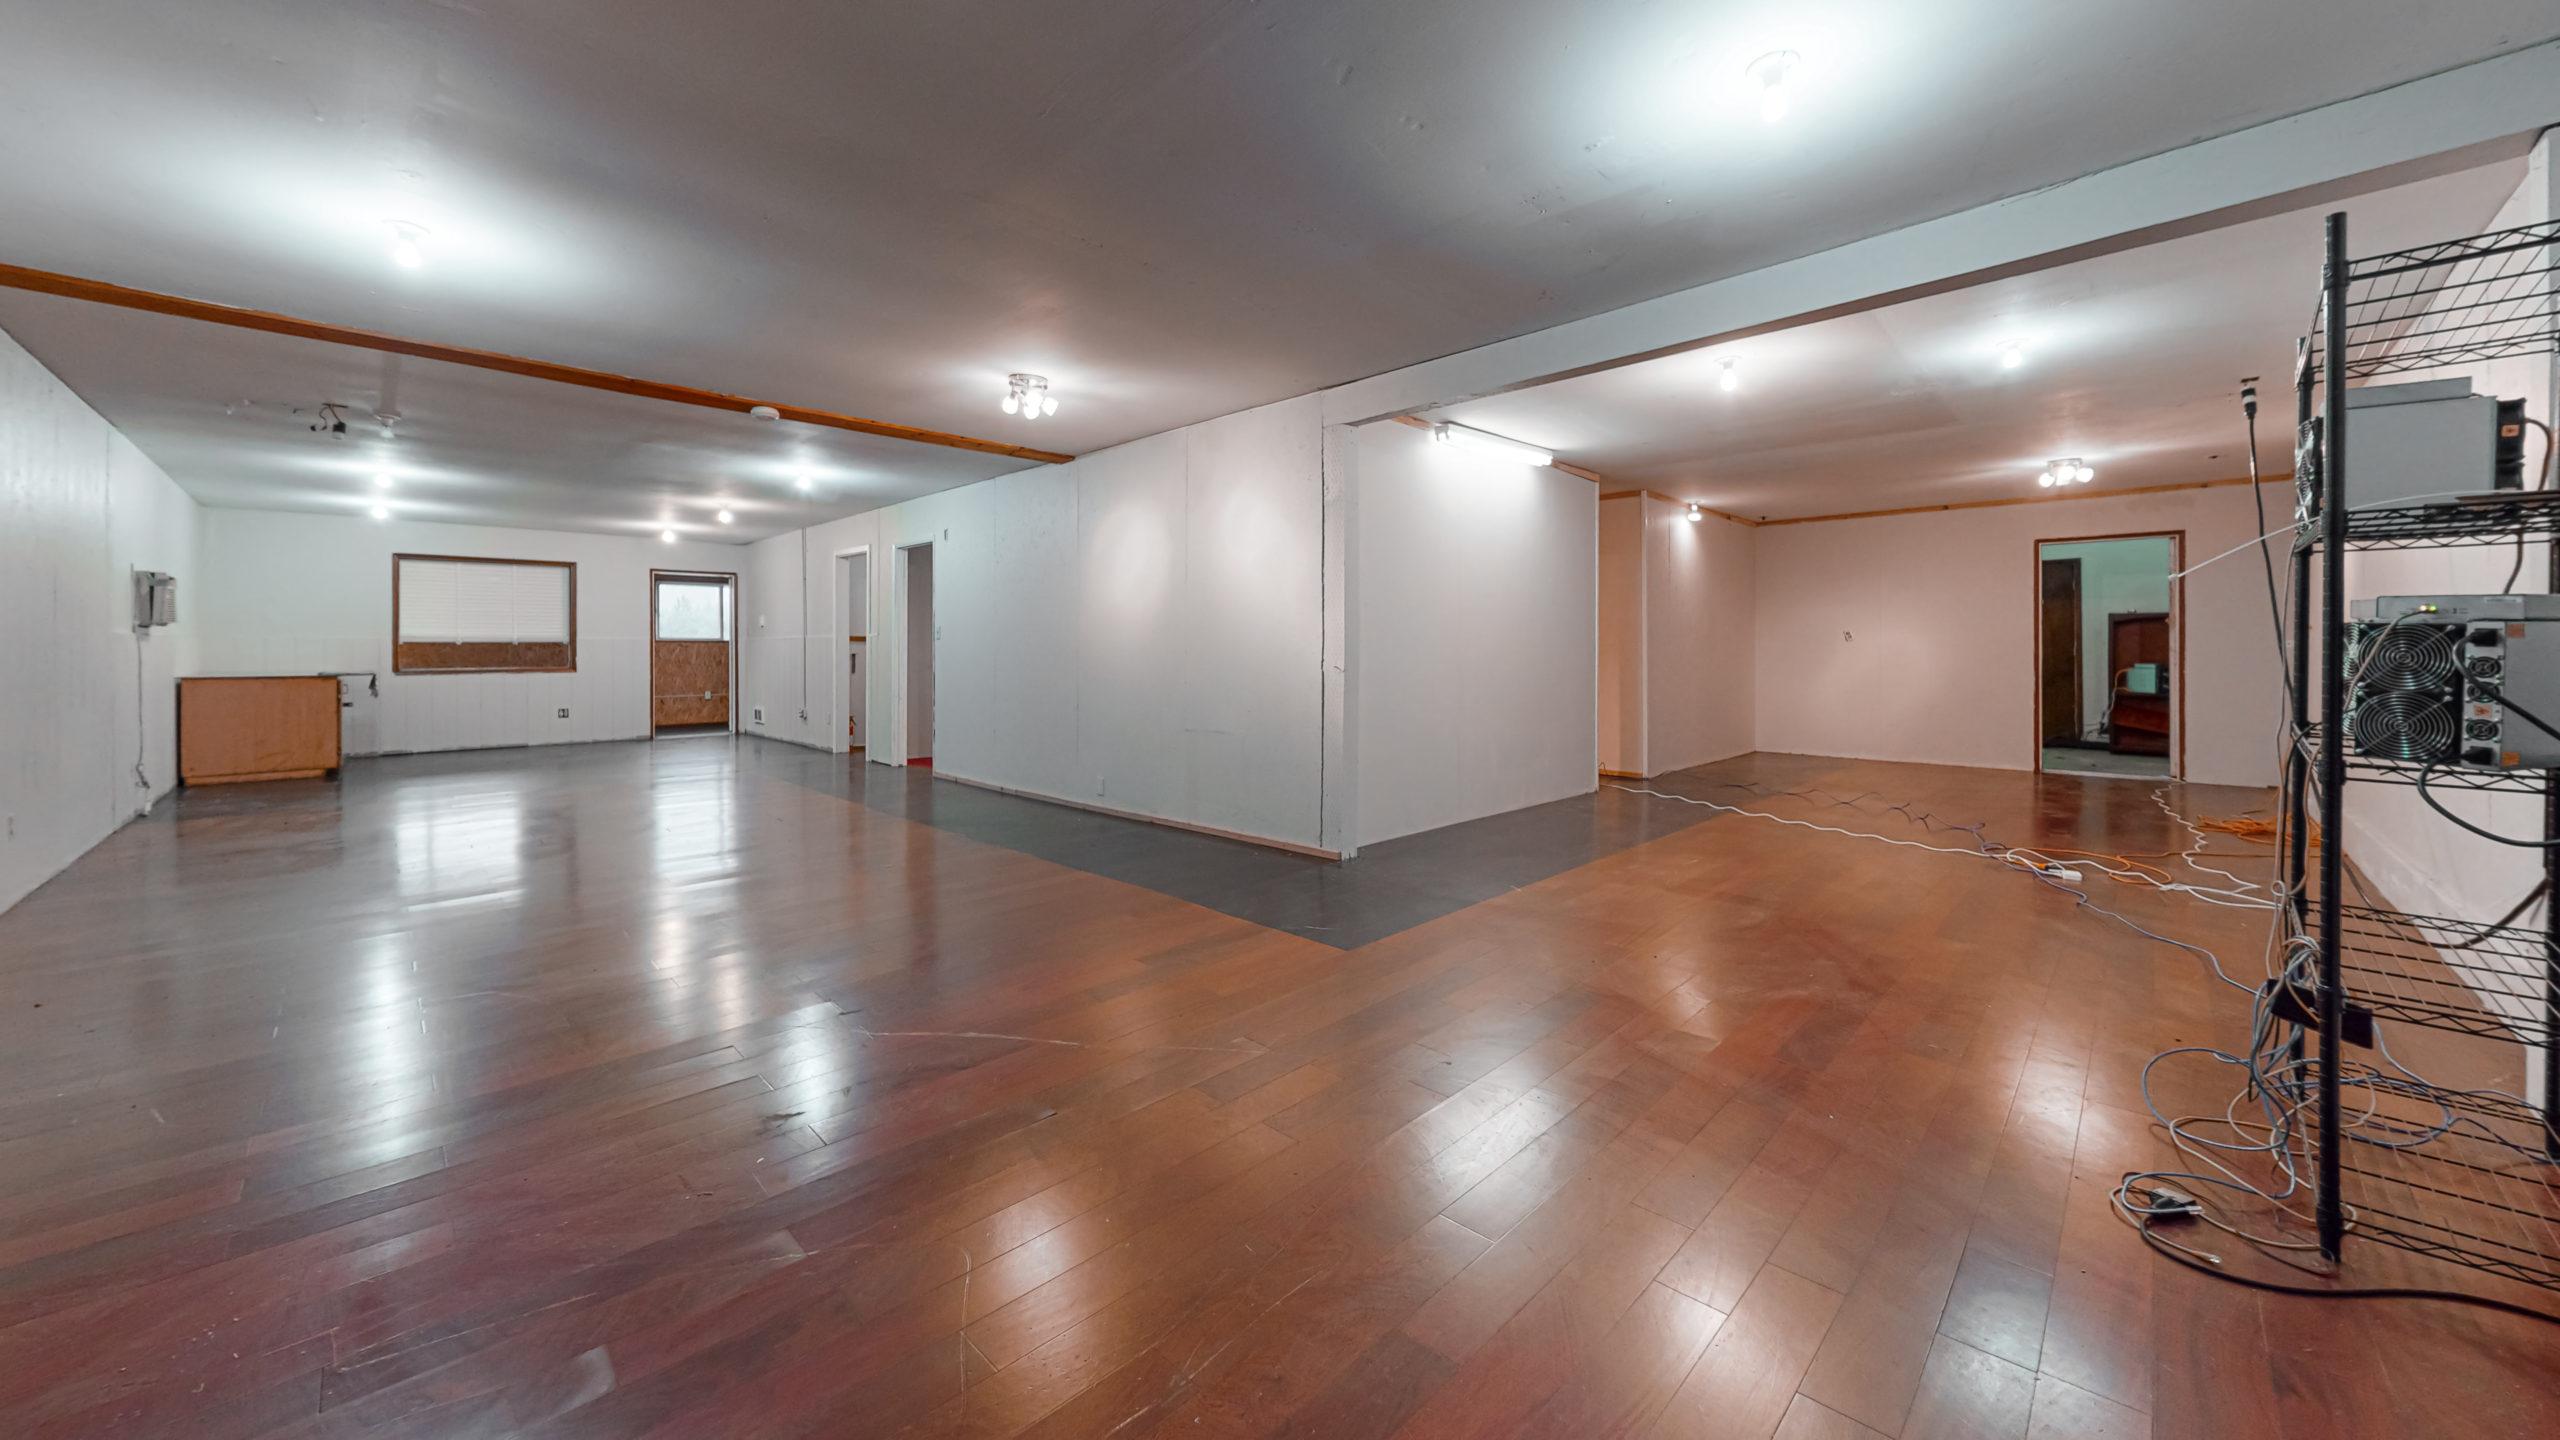 Mixed Use Retail or Office – 39618 NE 216th Ave – Amboy, WA